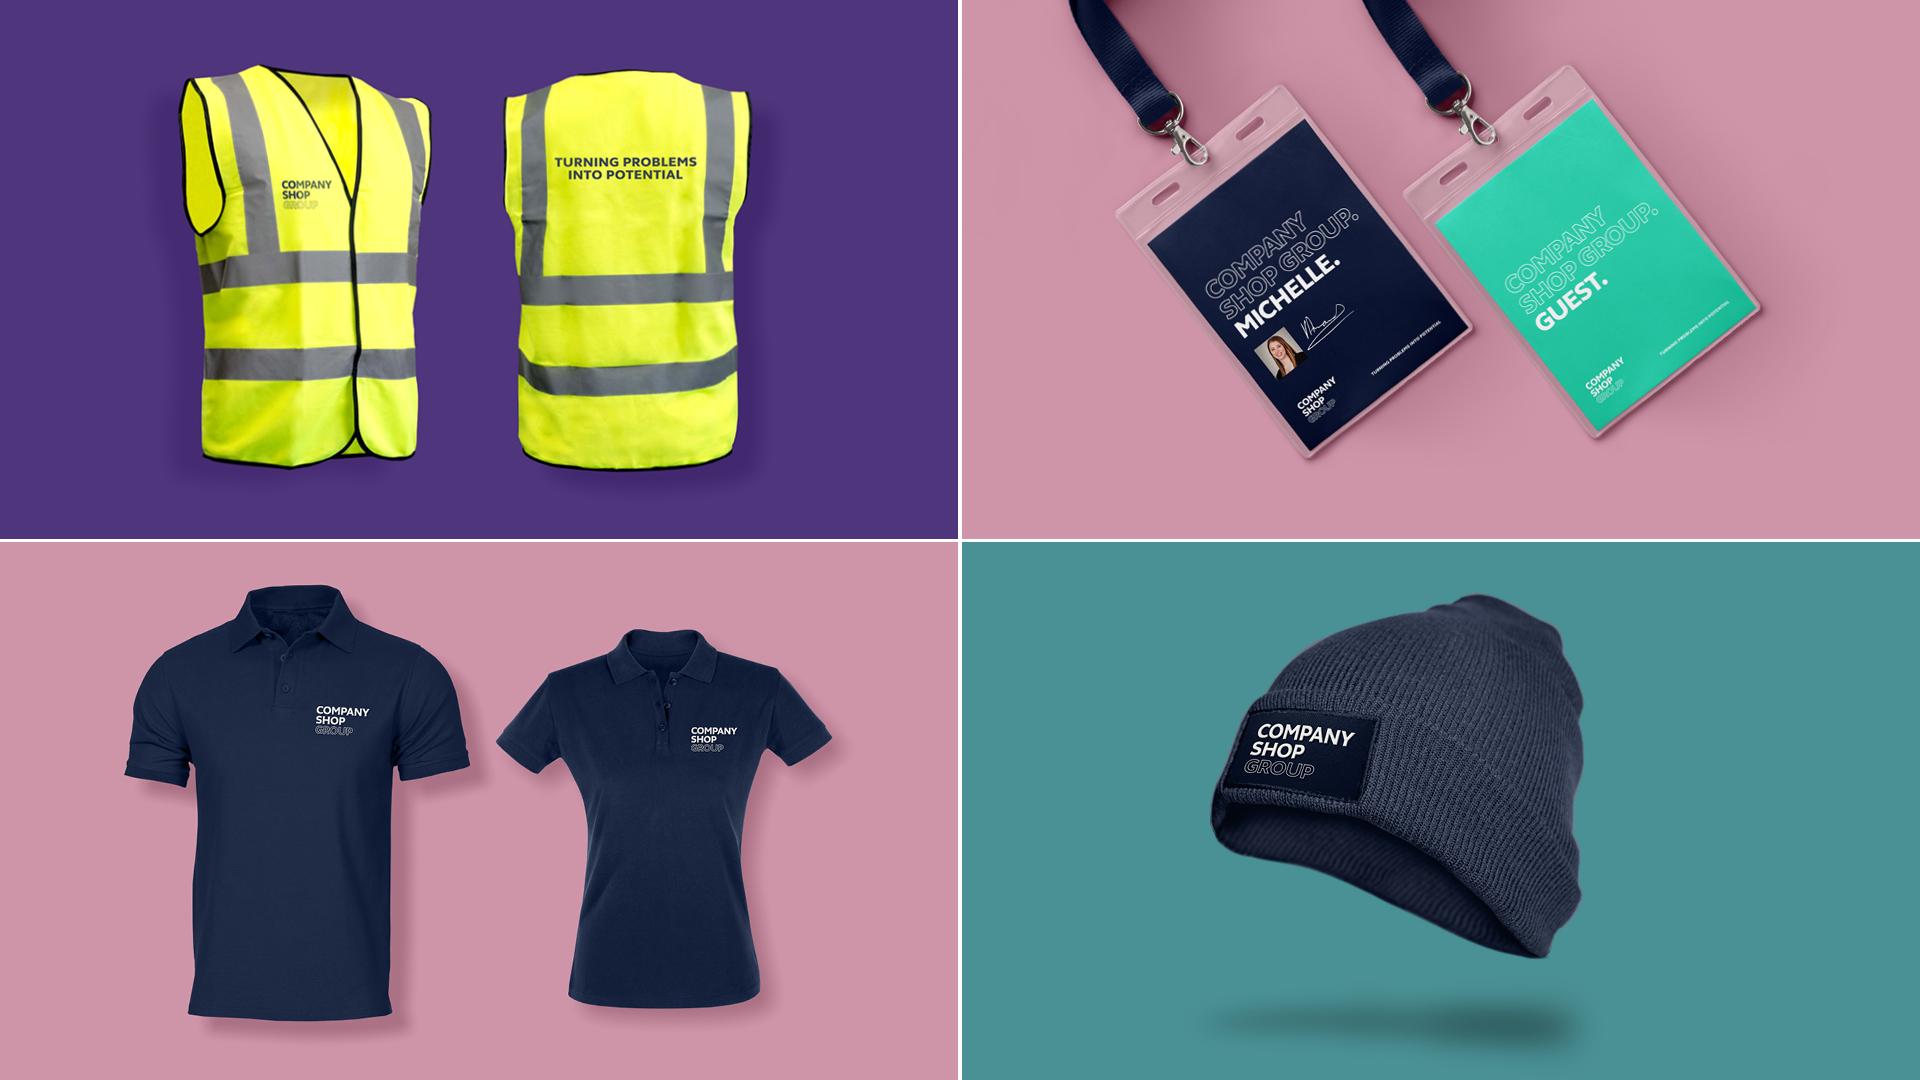 CSG Branded Workwear